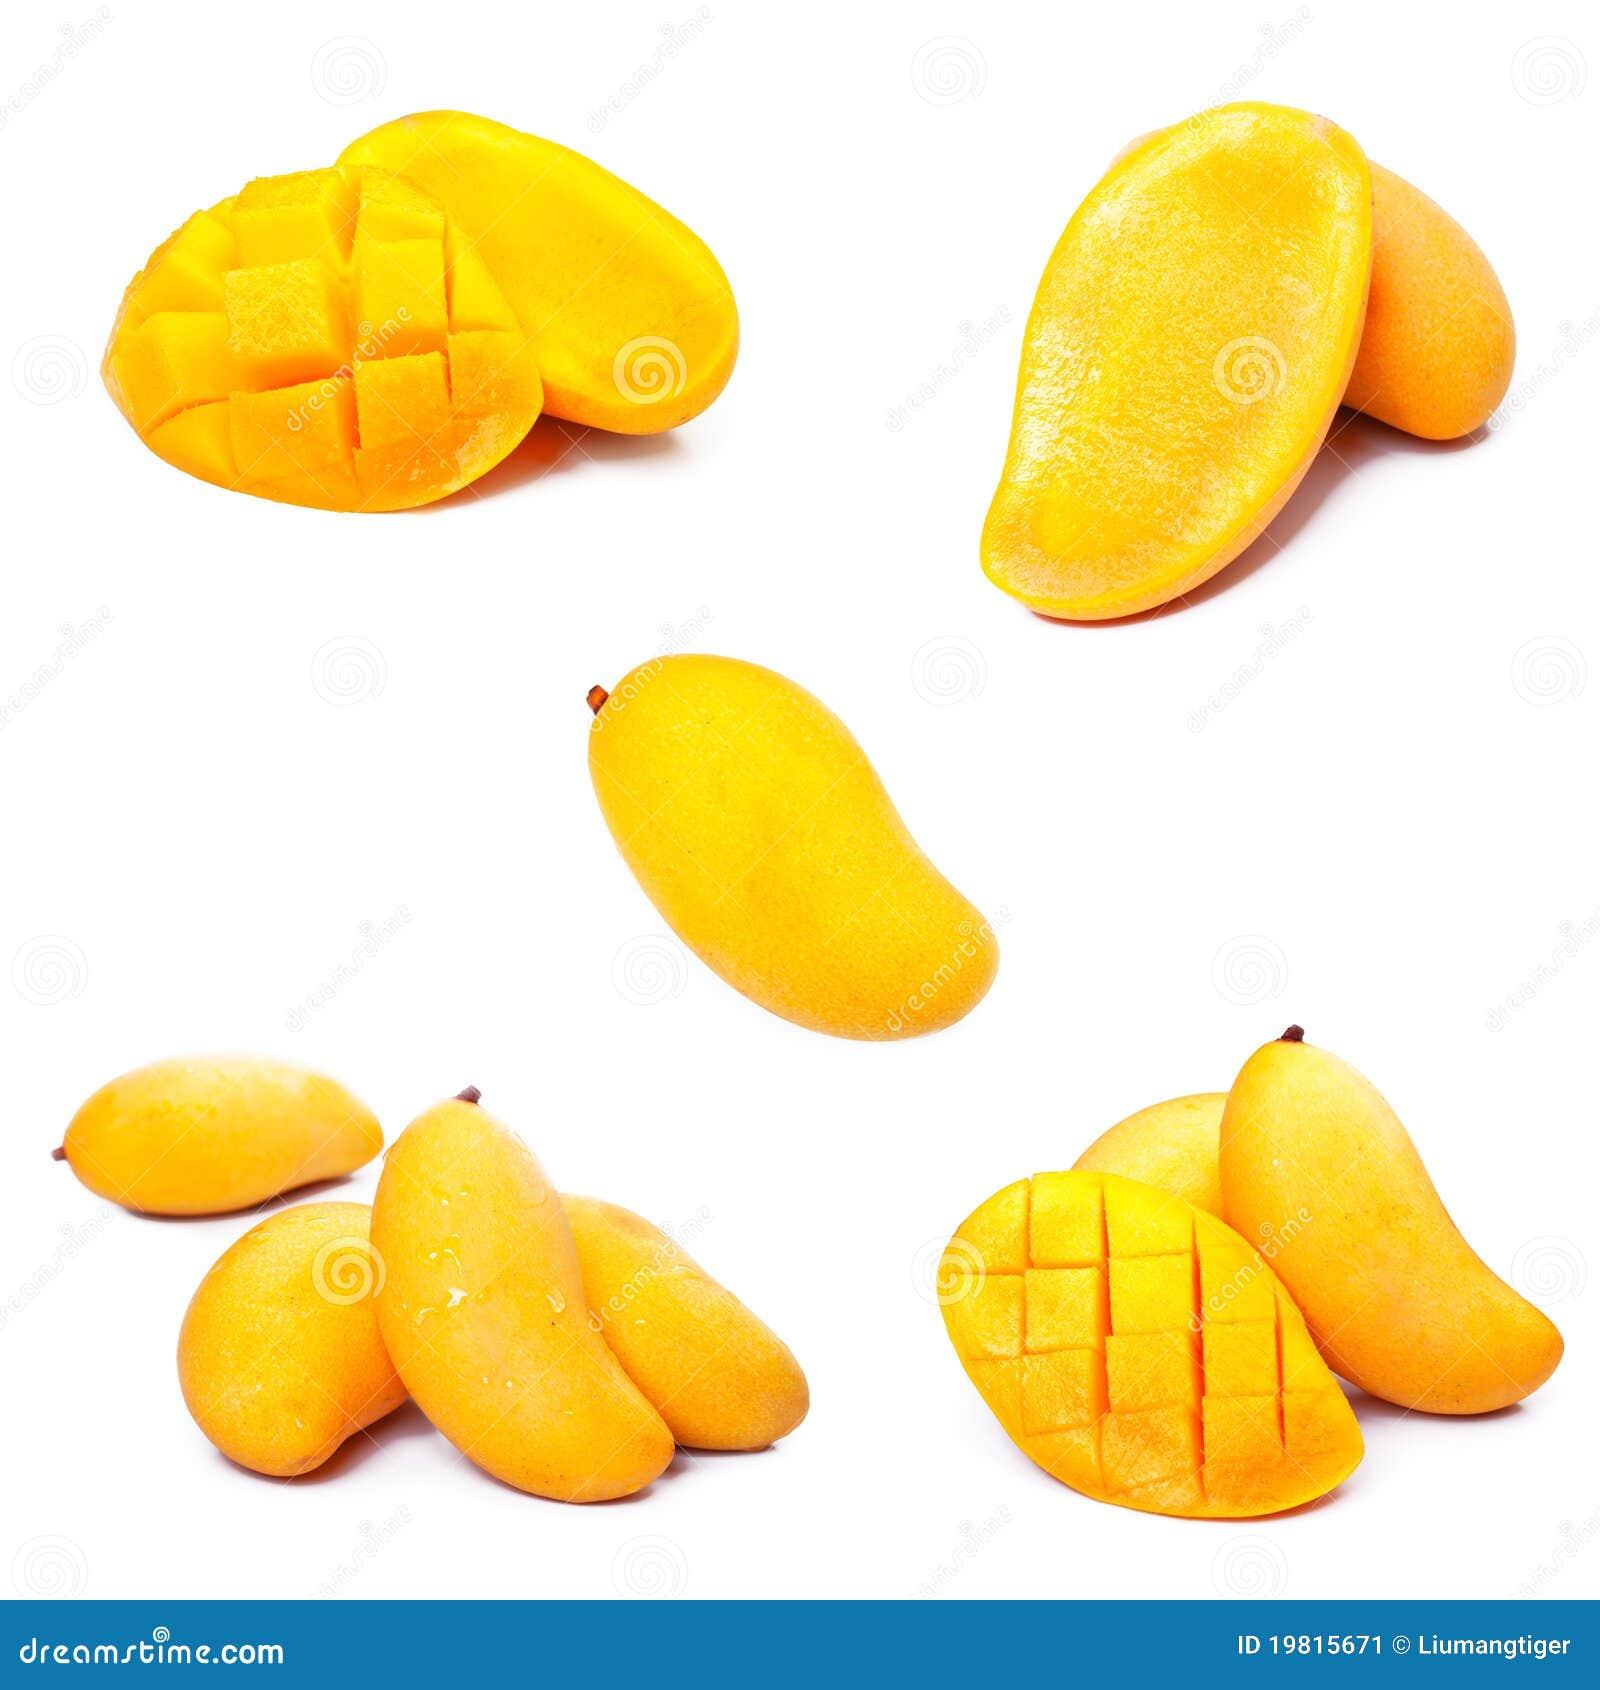 Red mango business plan